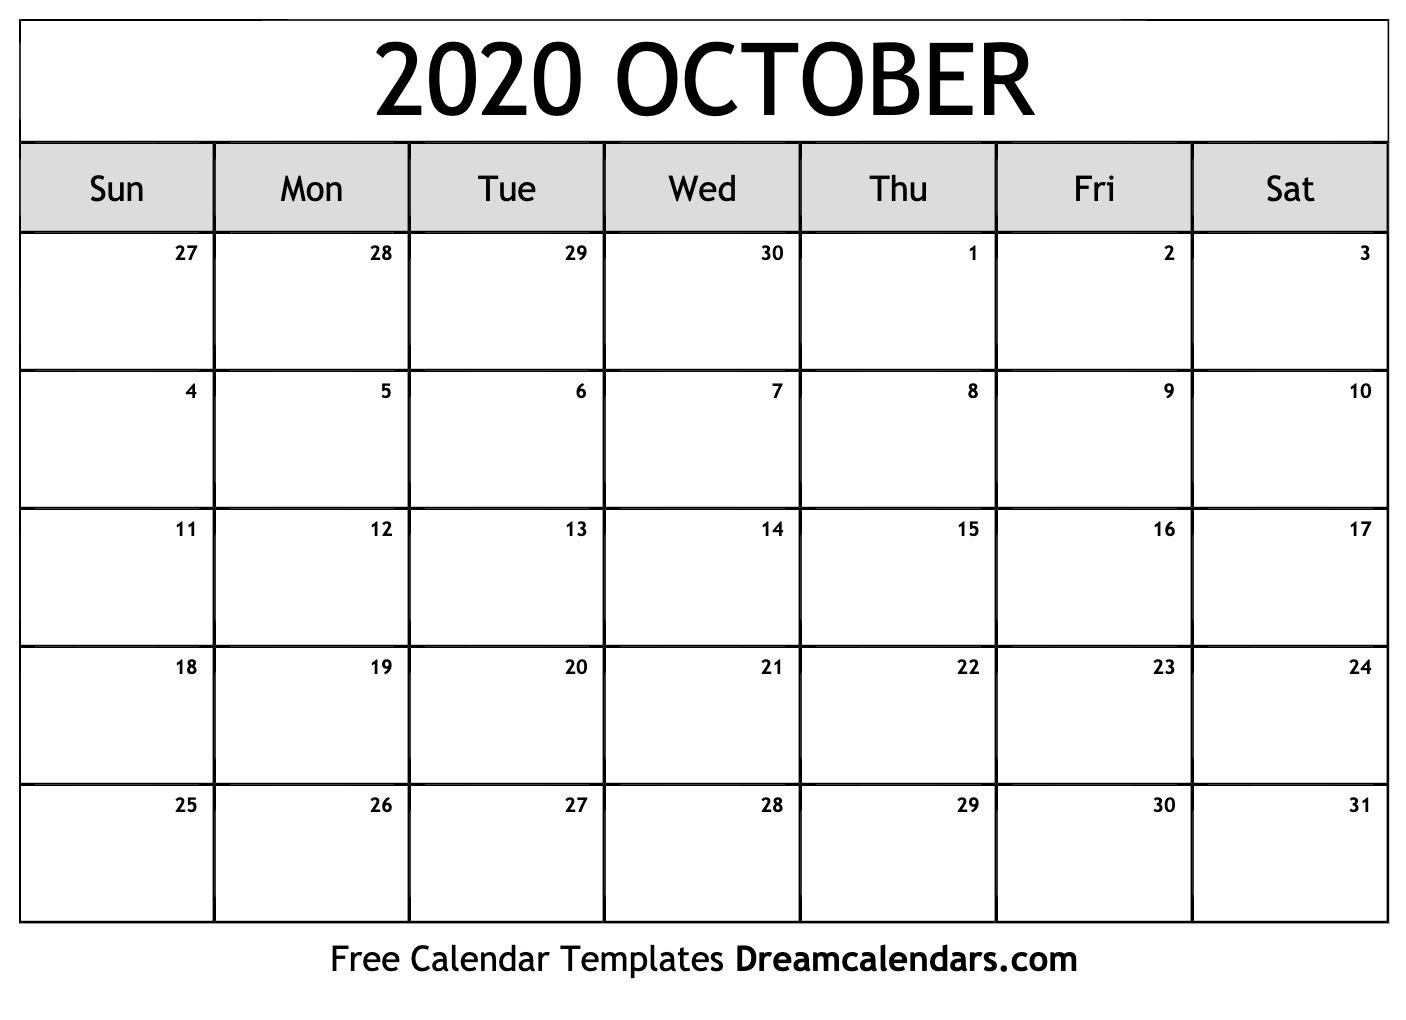 Free October 2020 Printable Calendar | Dream Calendars